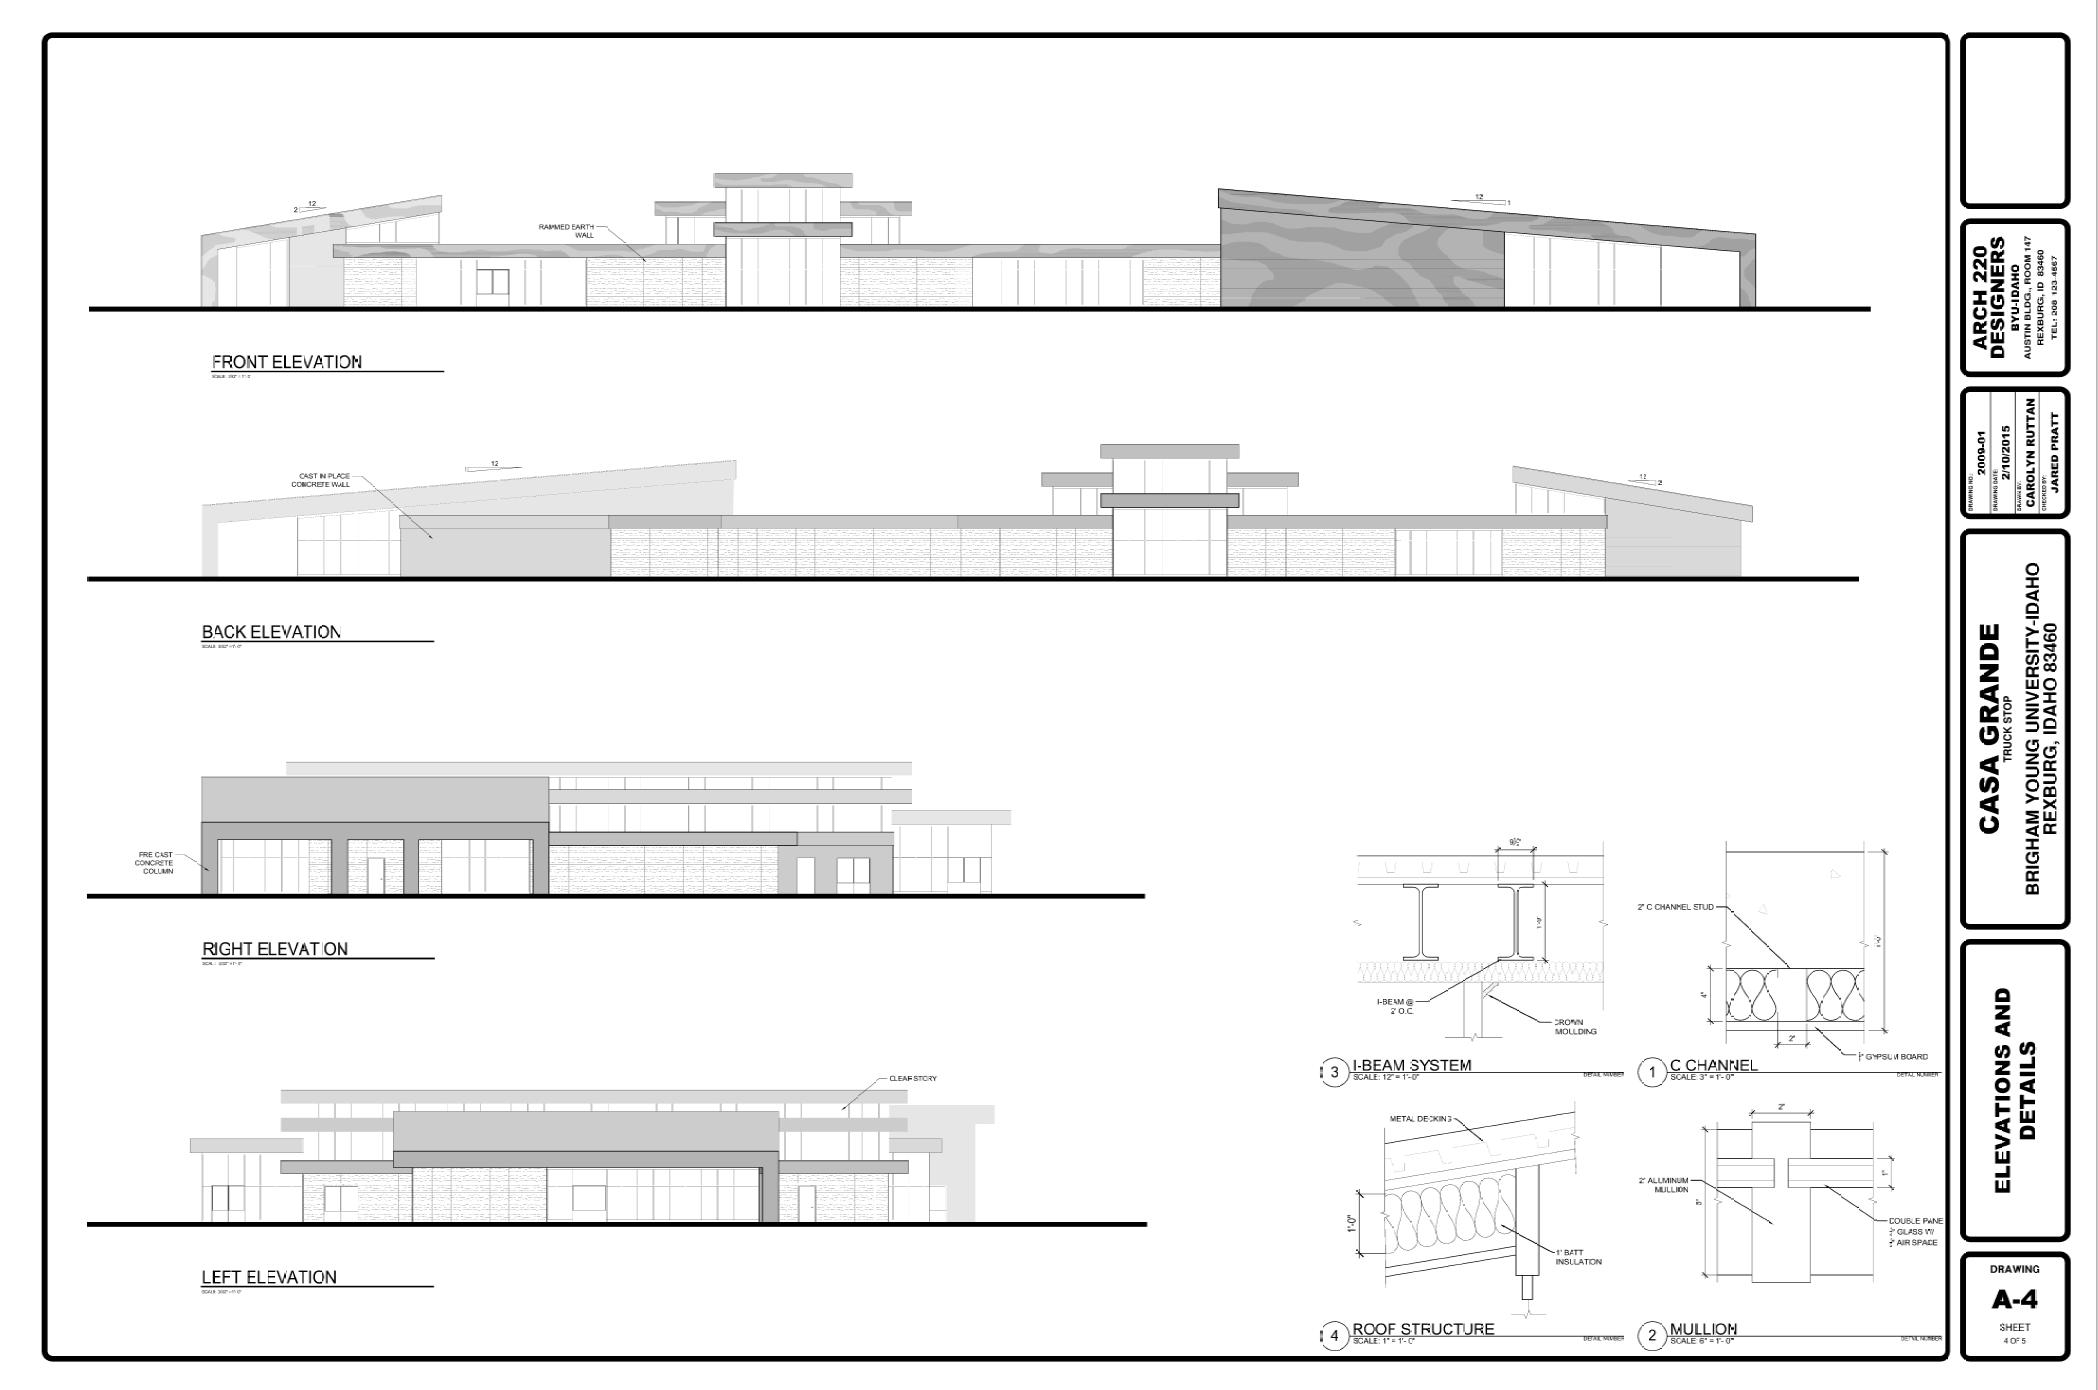 Carolyn Ruttan - AutoCAD Truck Stop Design